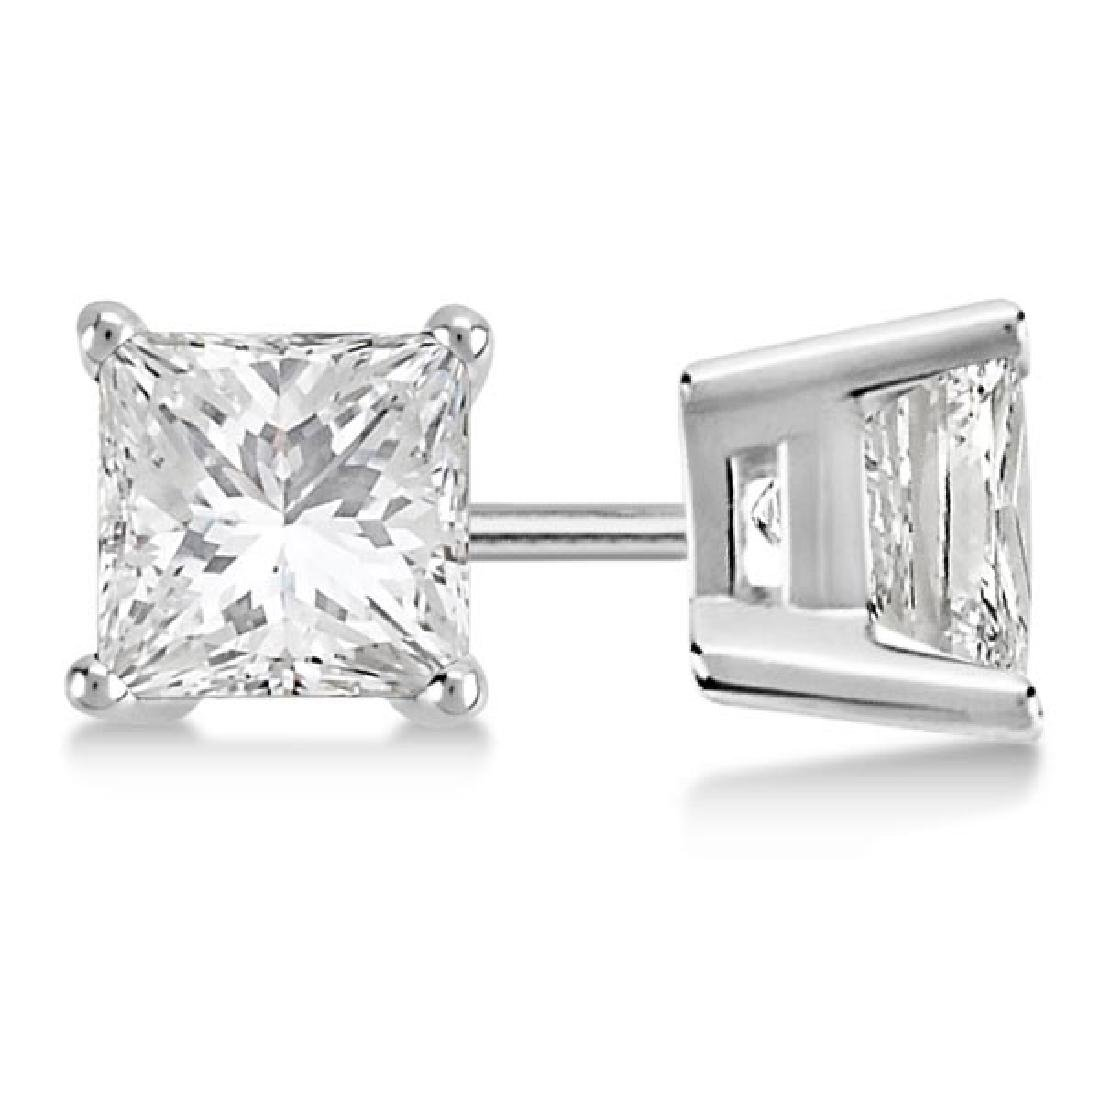 Certified 1.11 CTW Princess Diamond Stud Earrings G/SI1